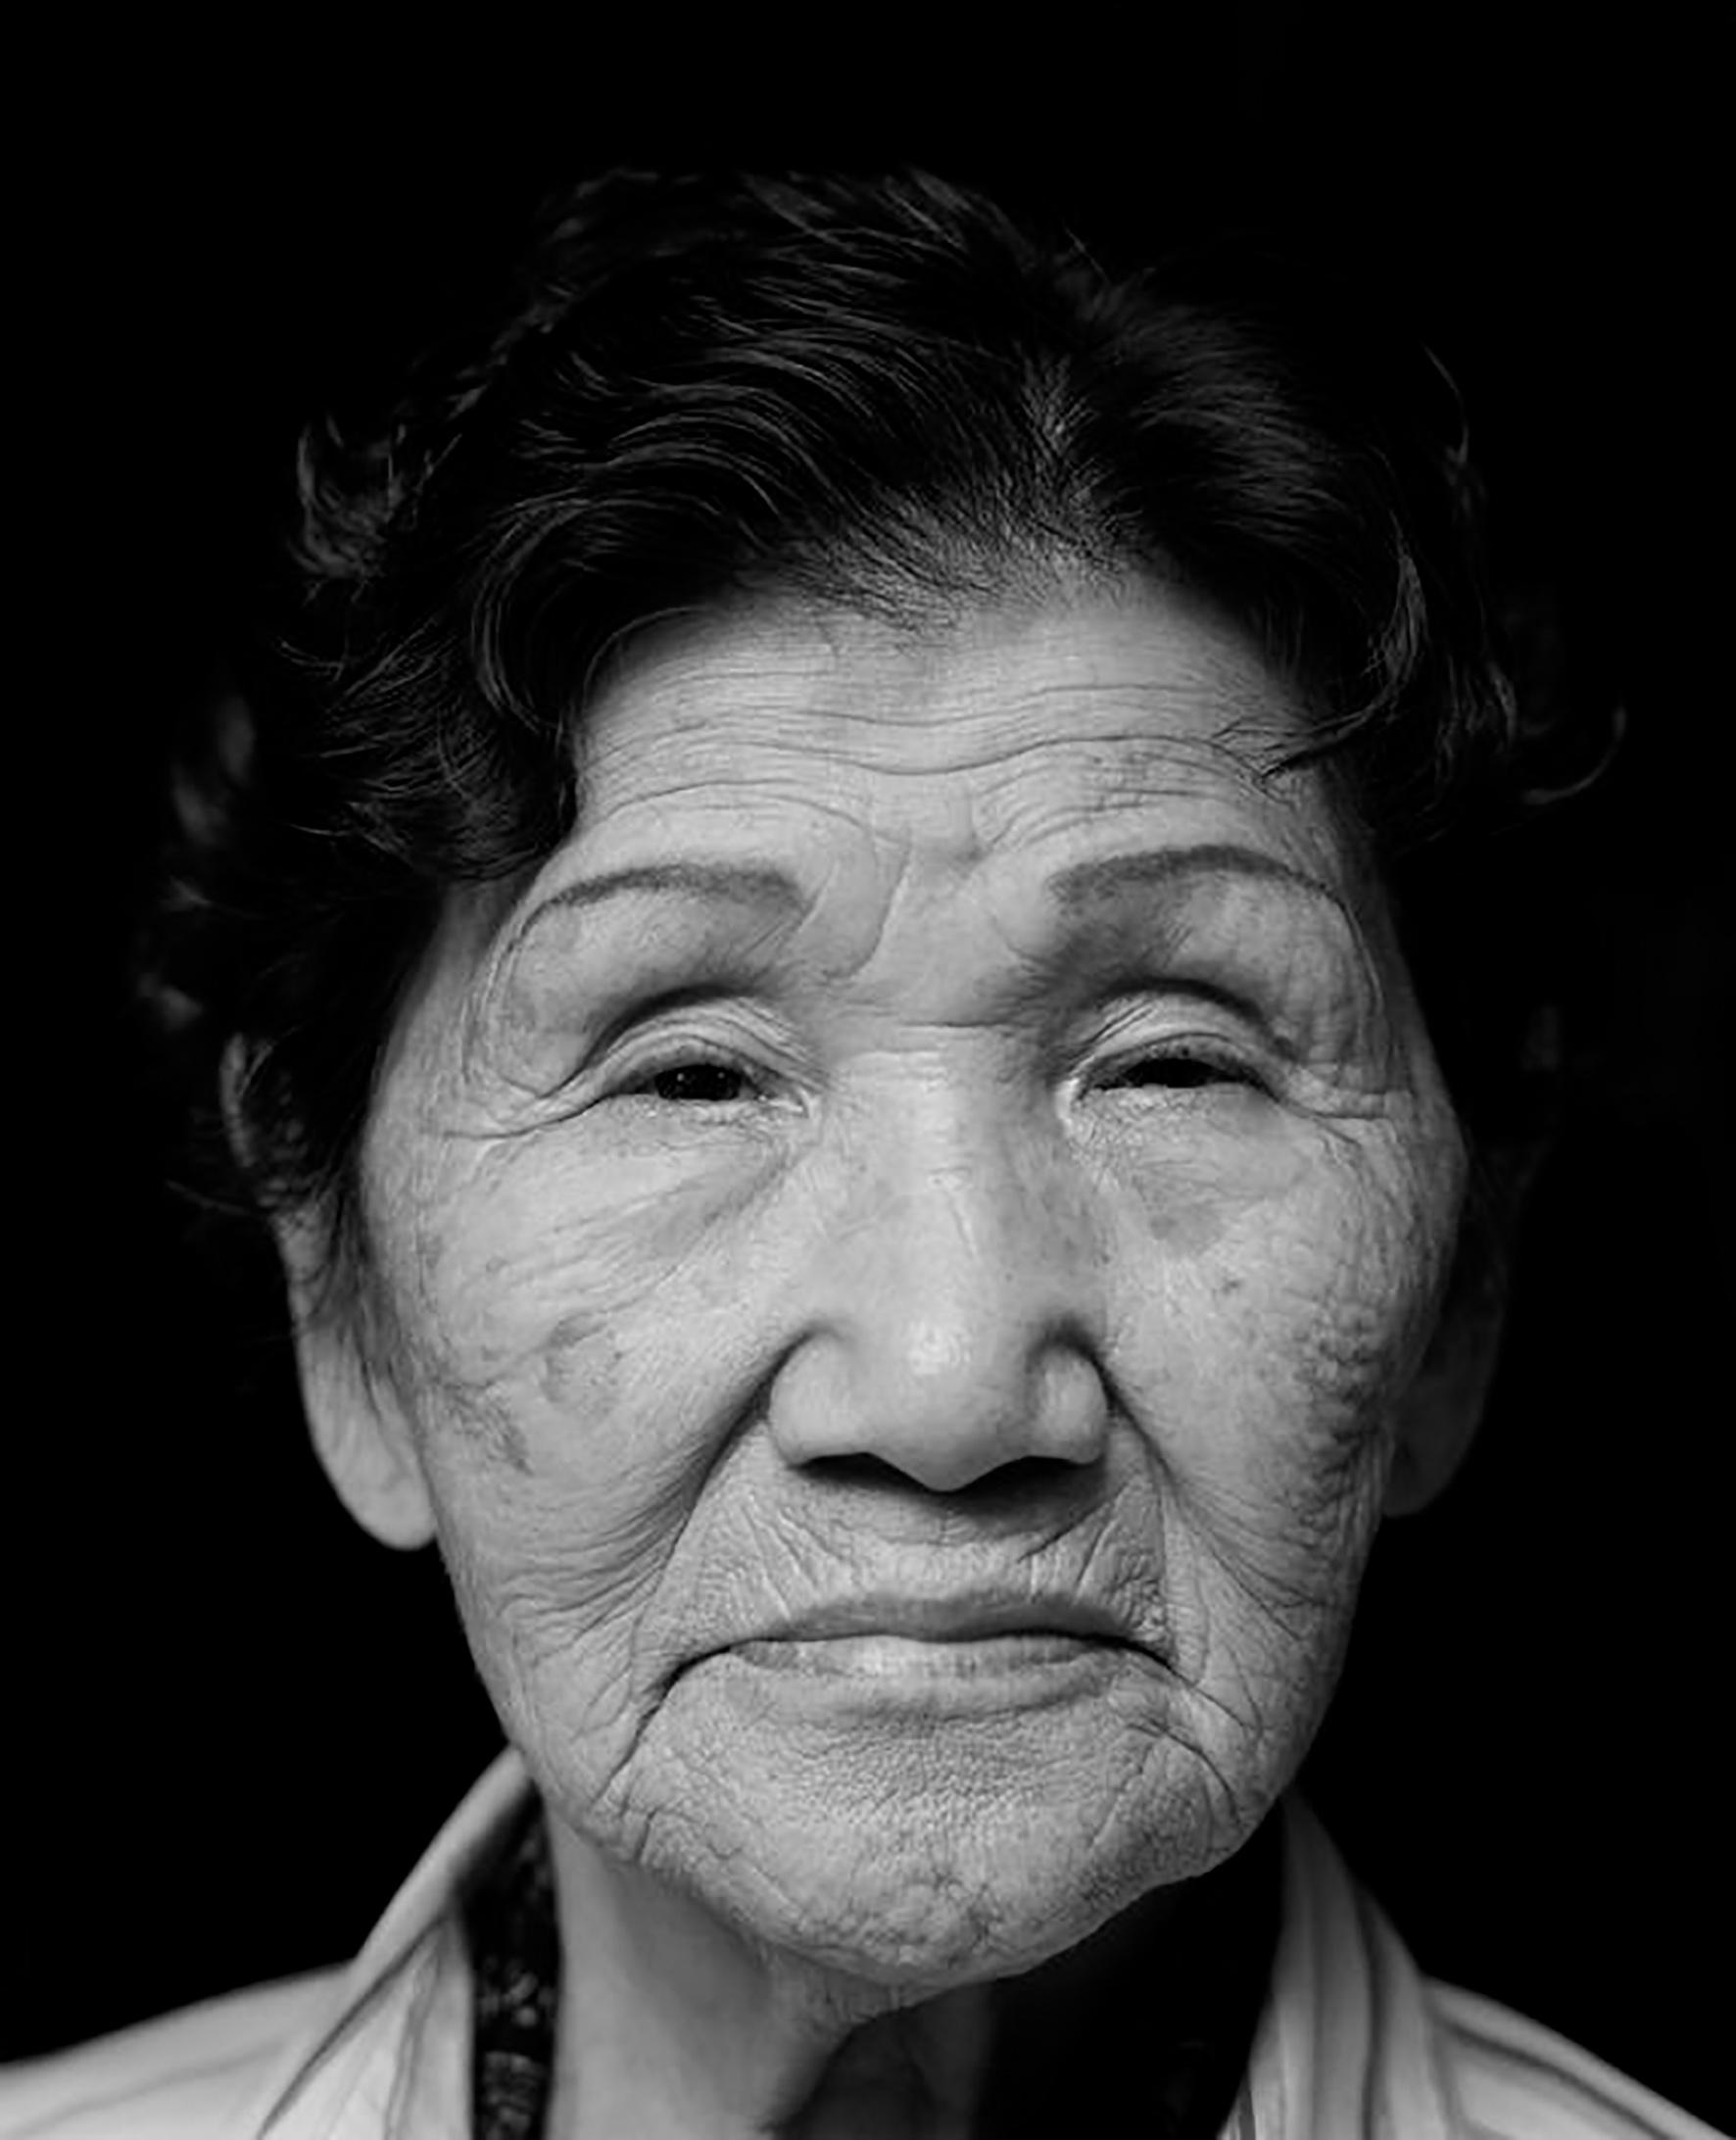 Korea. 2006. Comfort women. Jang Jum Dol